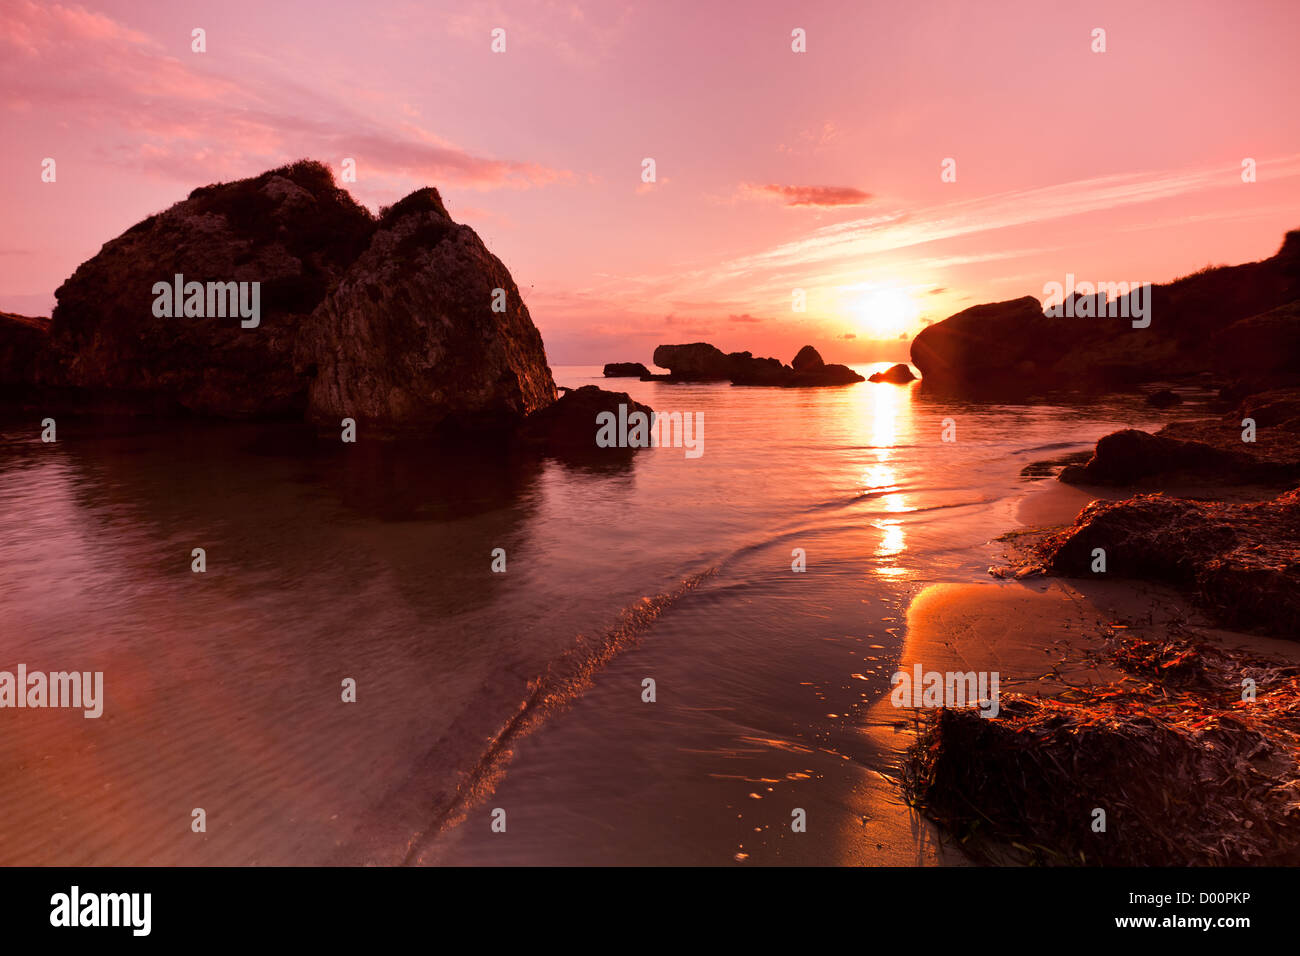 Porto Zoro beach sunrise - Stock Image